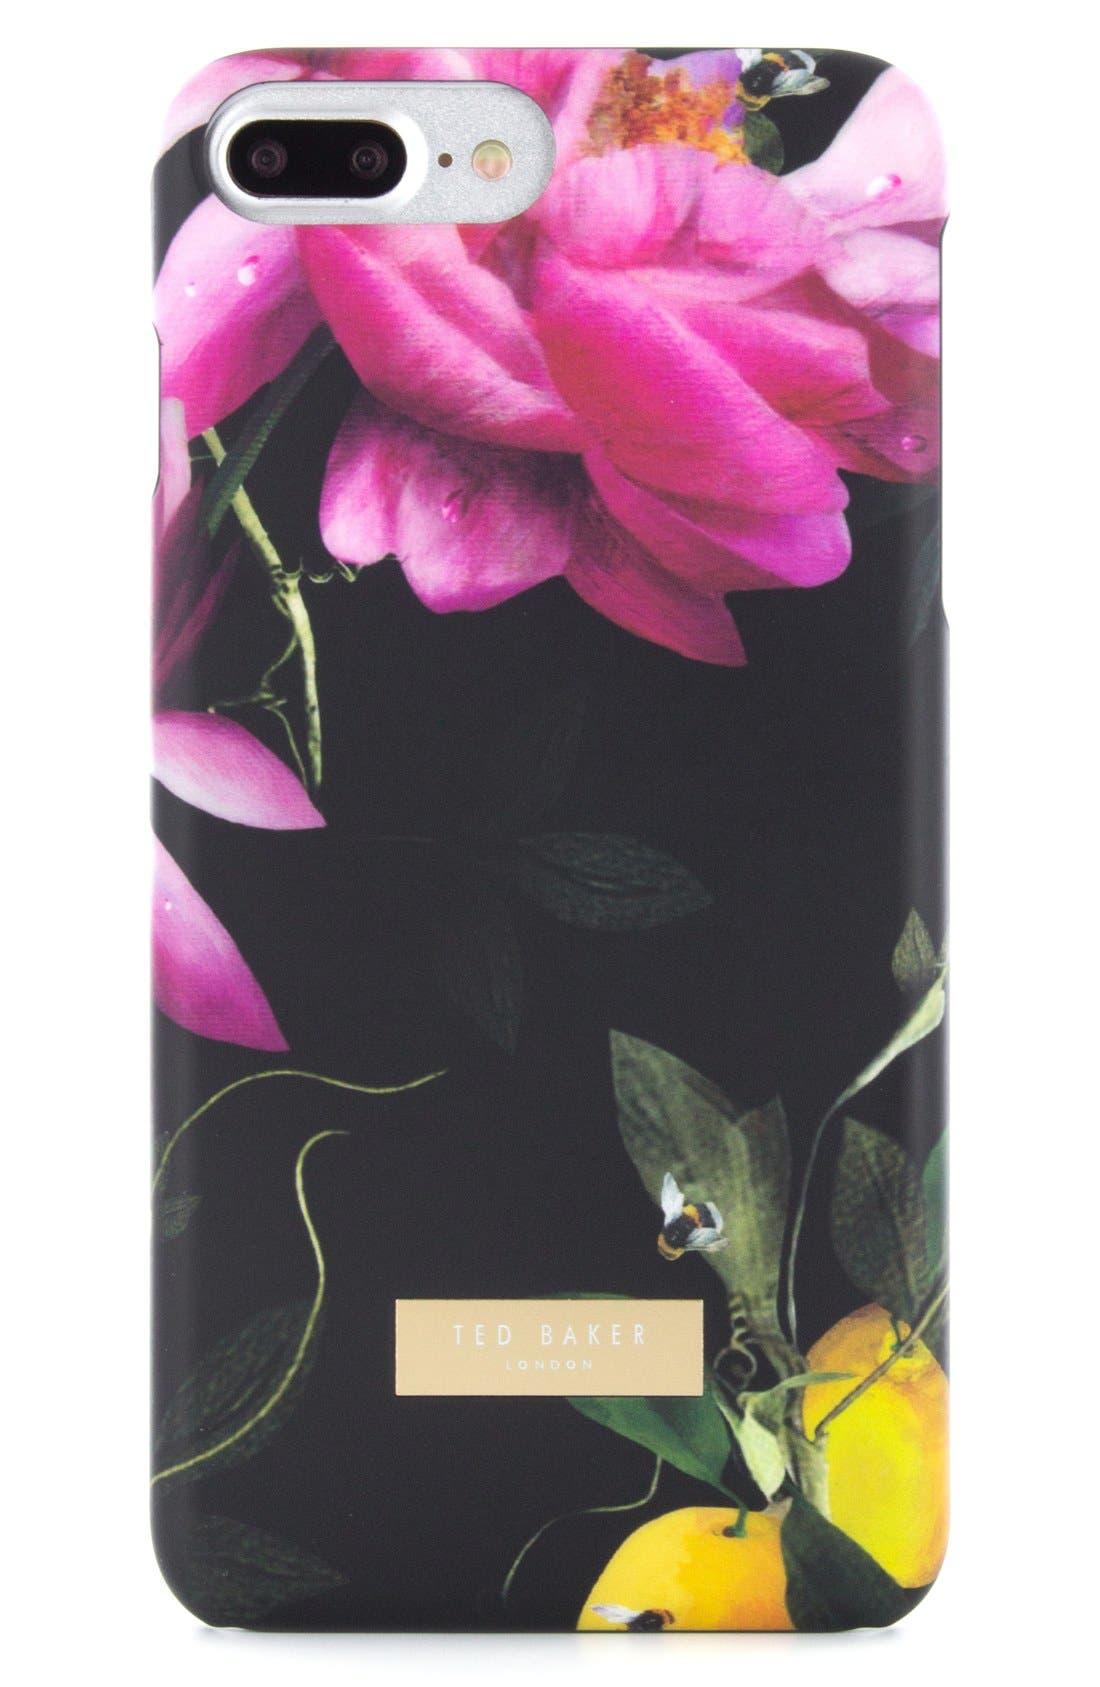 Main Image - Ted Baker London Citrus Bloom iPhone 6/6s/7/8 & 6/7/8 Plus Case